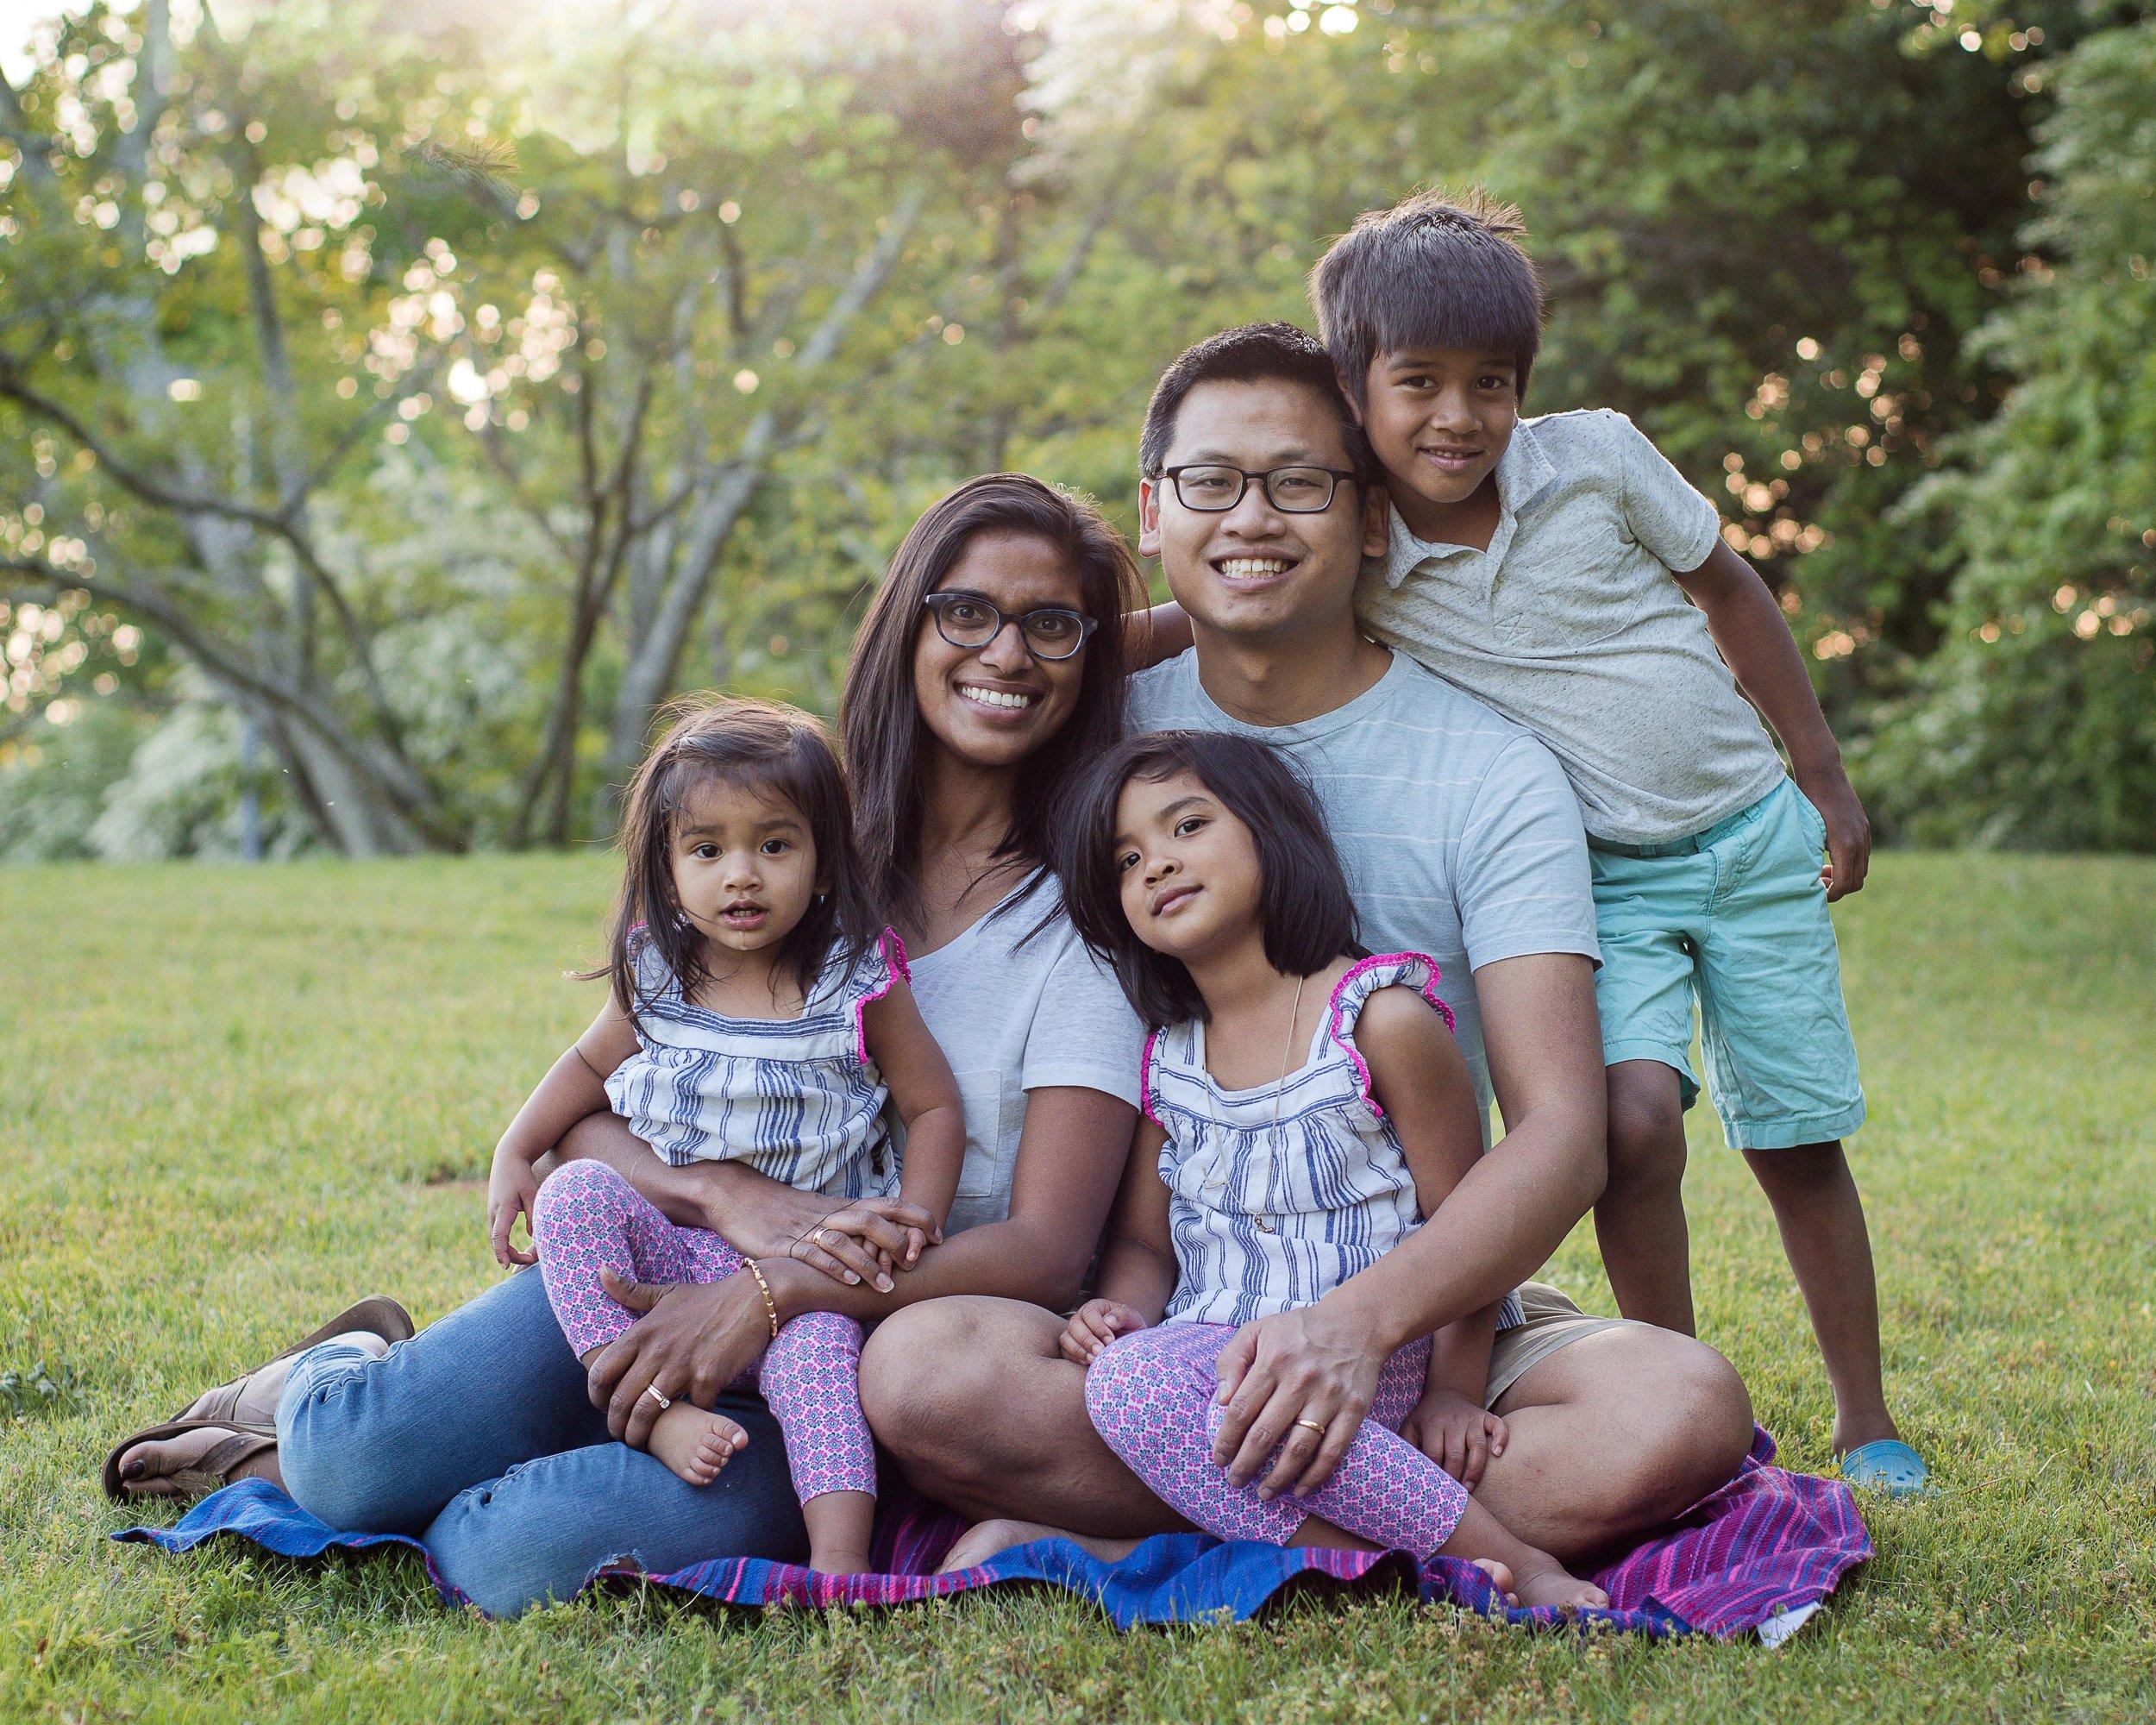 fun-family-session-photo-clothes